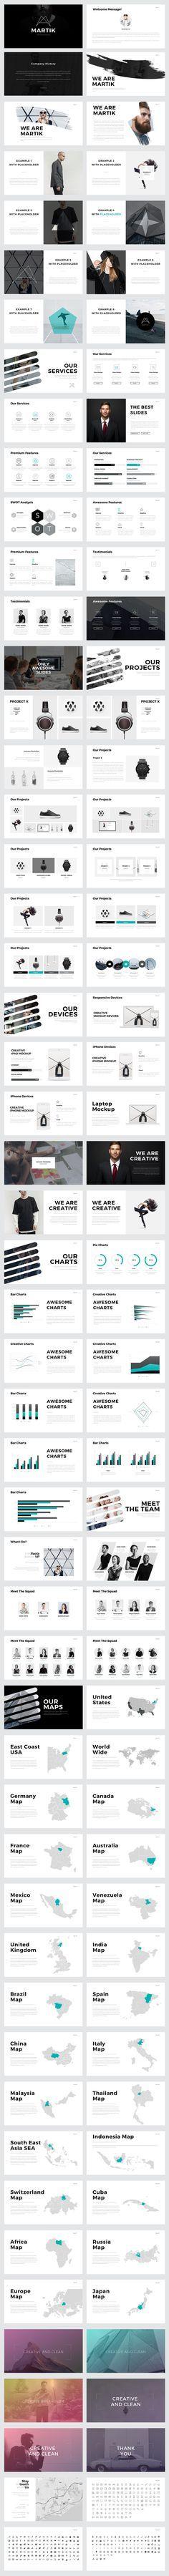 Martik PowerPoint Template: presentation design with a minimal, yet gorgeous layout #ppt Download: https://creativemarket.com/Slidedizer/494473-Martik-PowerPoint-Template/?u=nexion